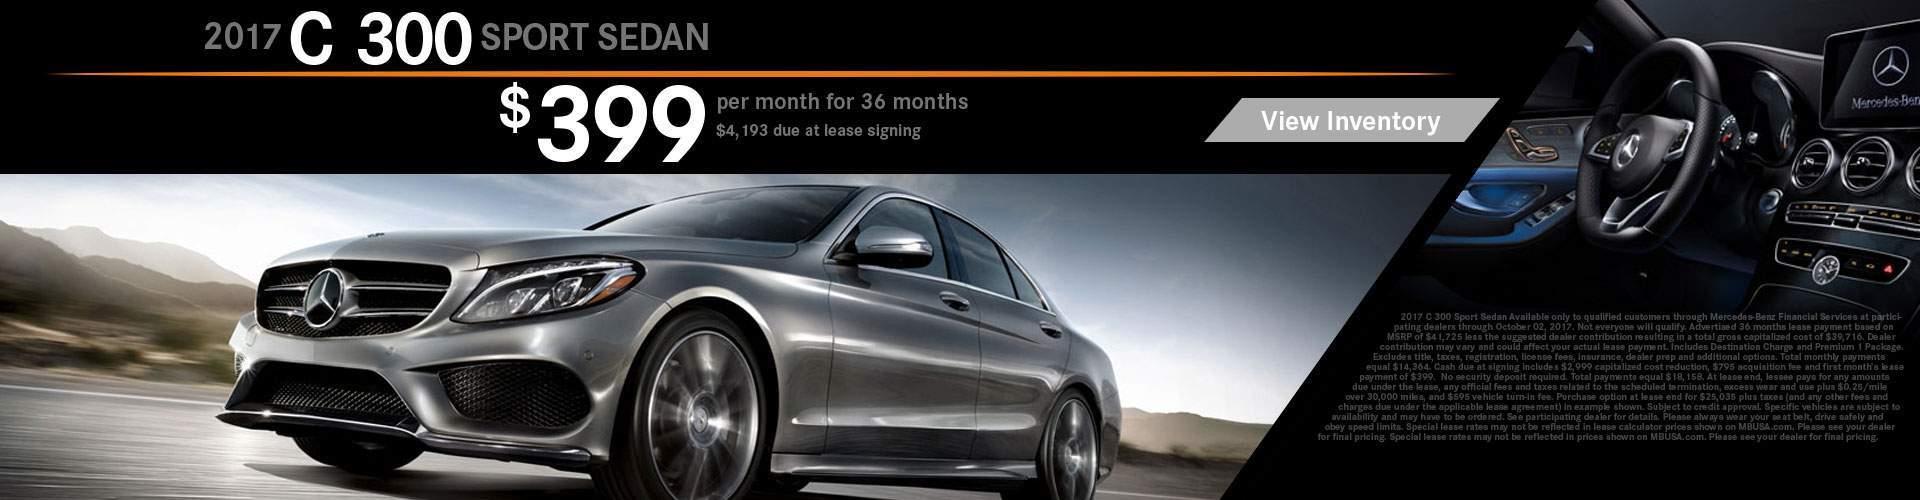 mercedes-benz dealership scottsdale az | used cars mercedes-benz